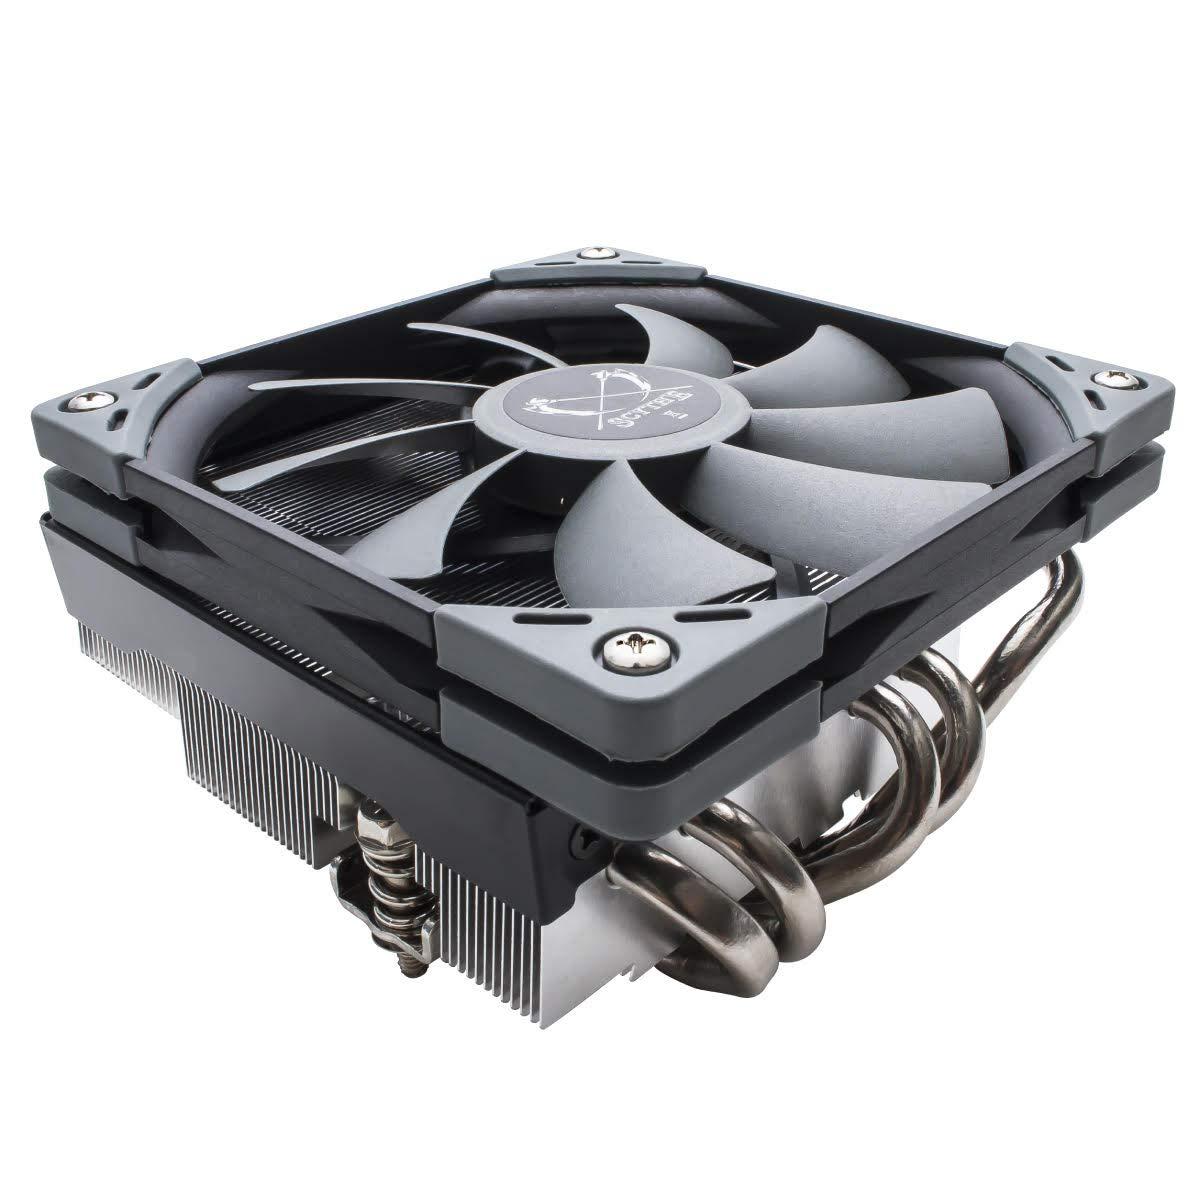 Scythe Big Shuriken 3 Low Profile 120mm Air CPU Cooler, Slim PWM Fan with 5 Heatpipe Heatsink, for Mini ITX Case, Intel LGA1151, AMD AM4/Ryzen by SCYTHE